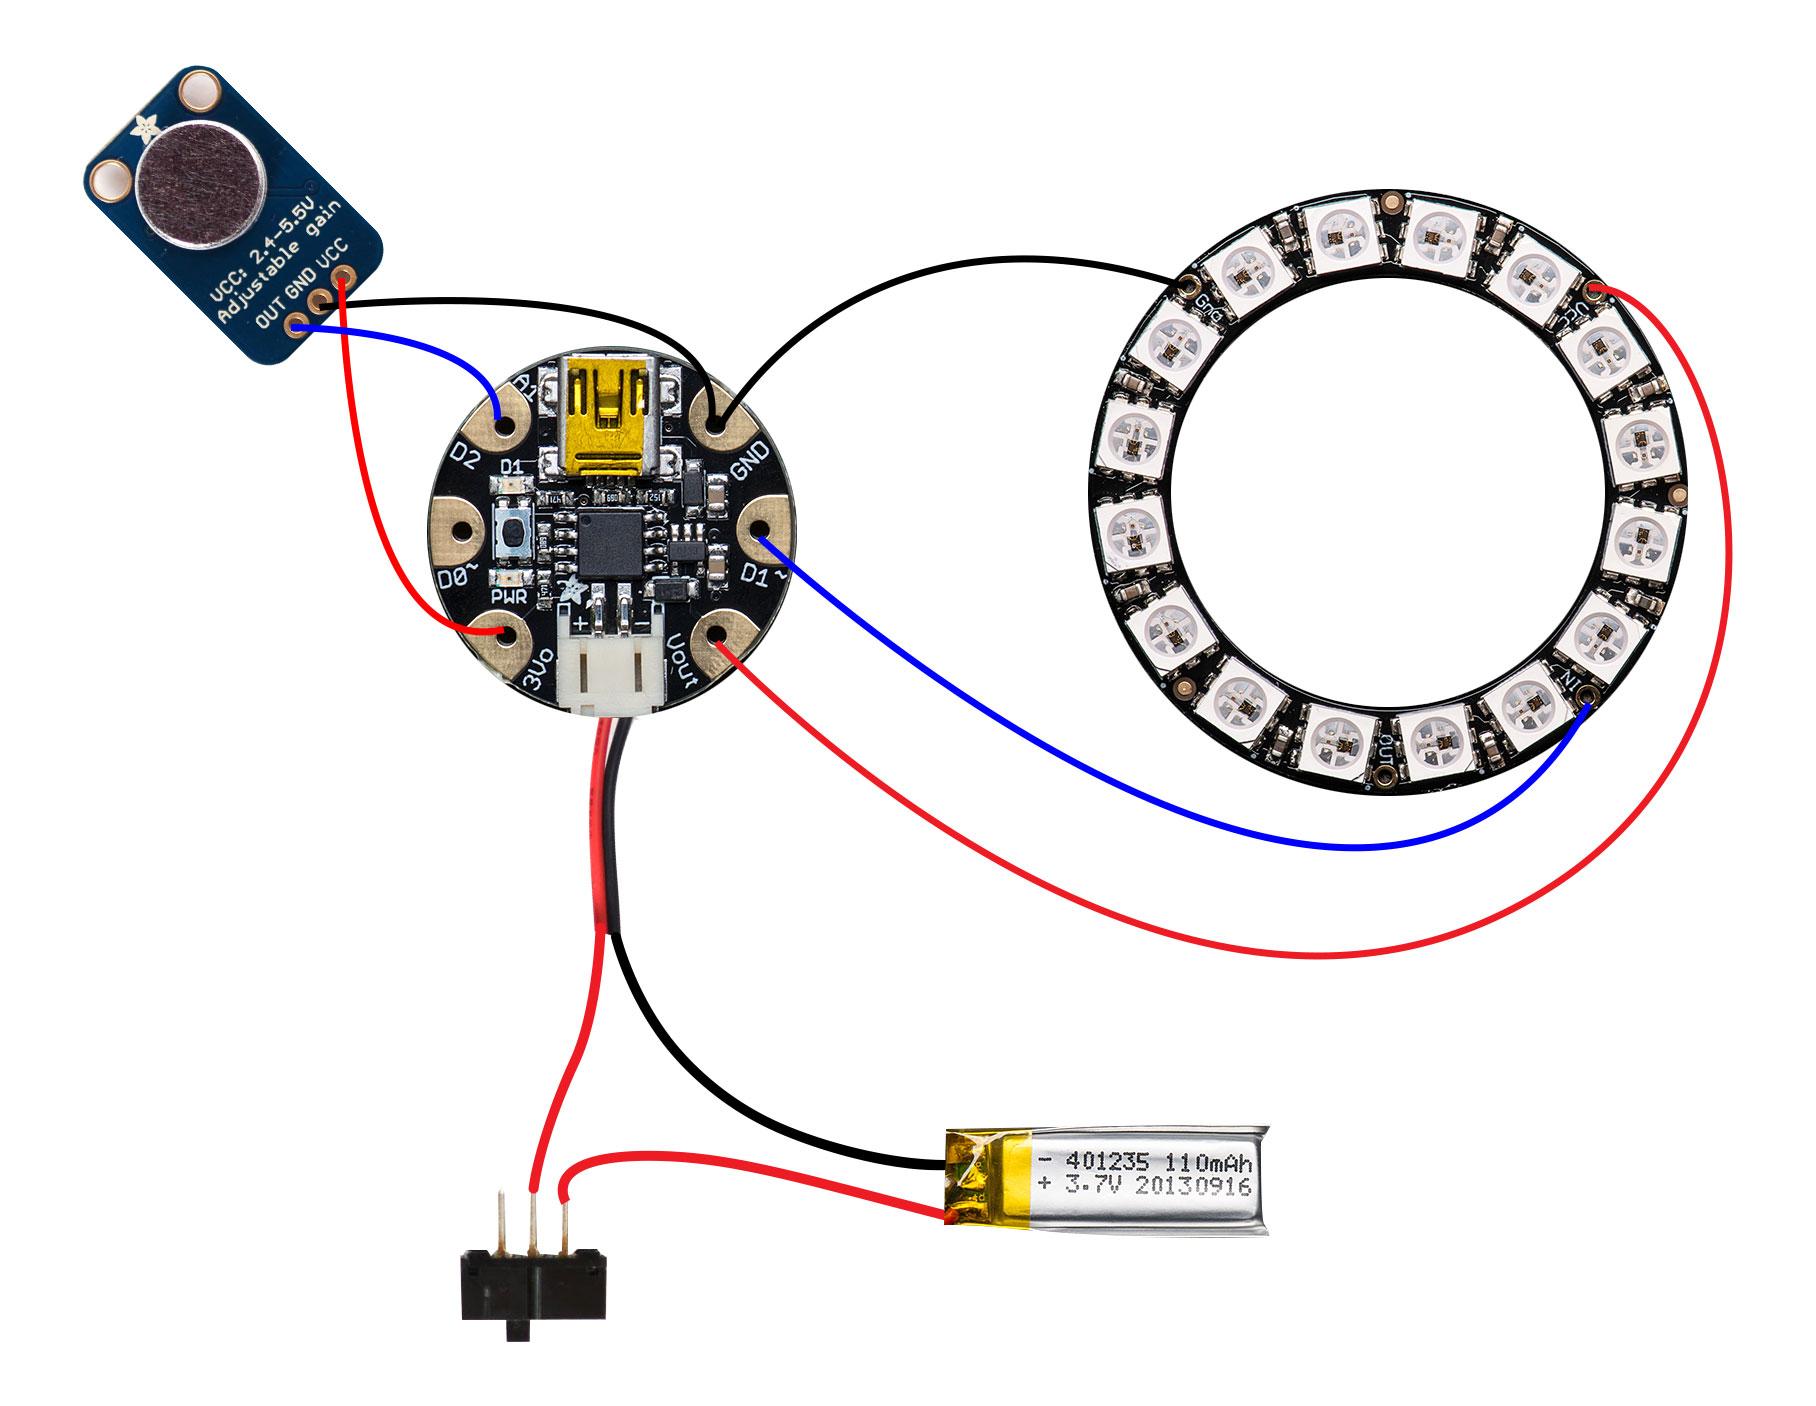 3d_printing_micFlag-circuit-Layout.jpg